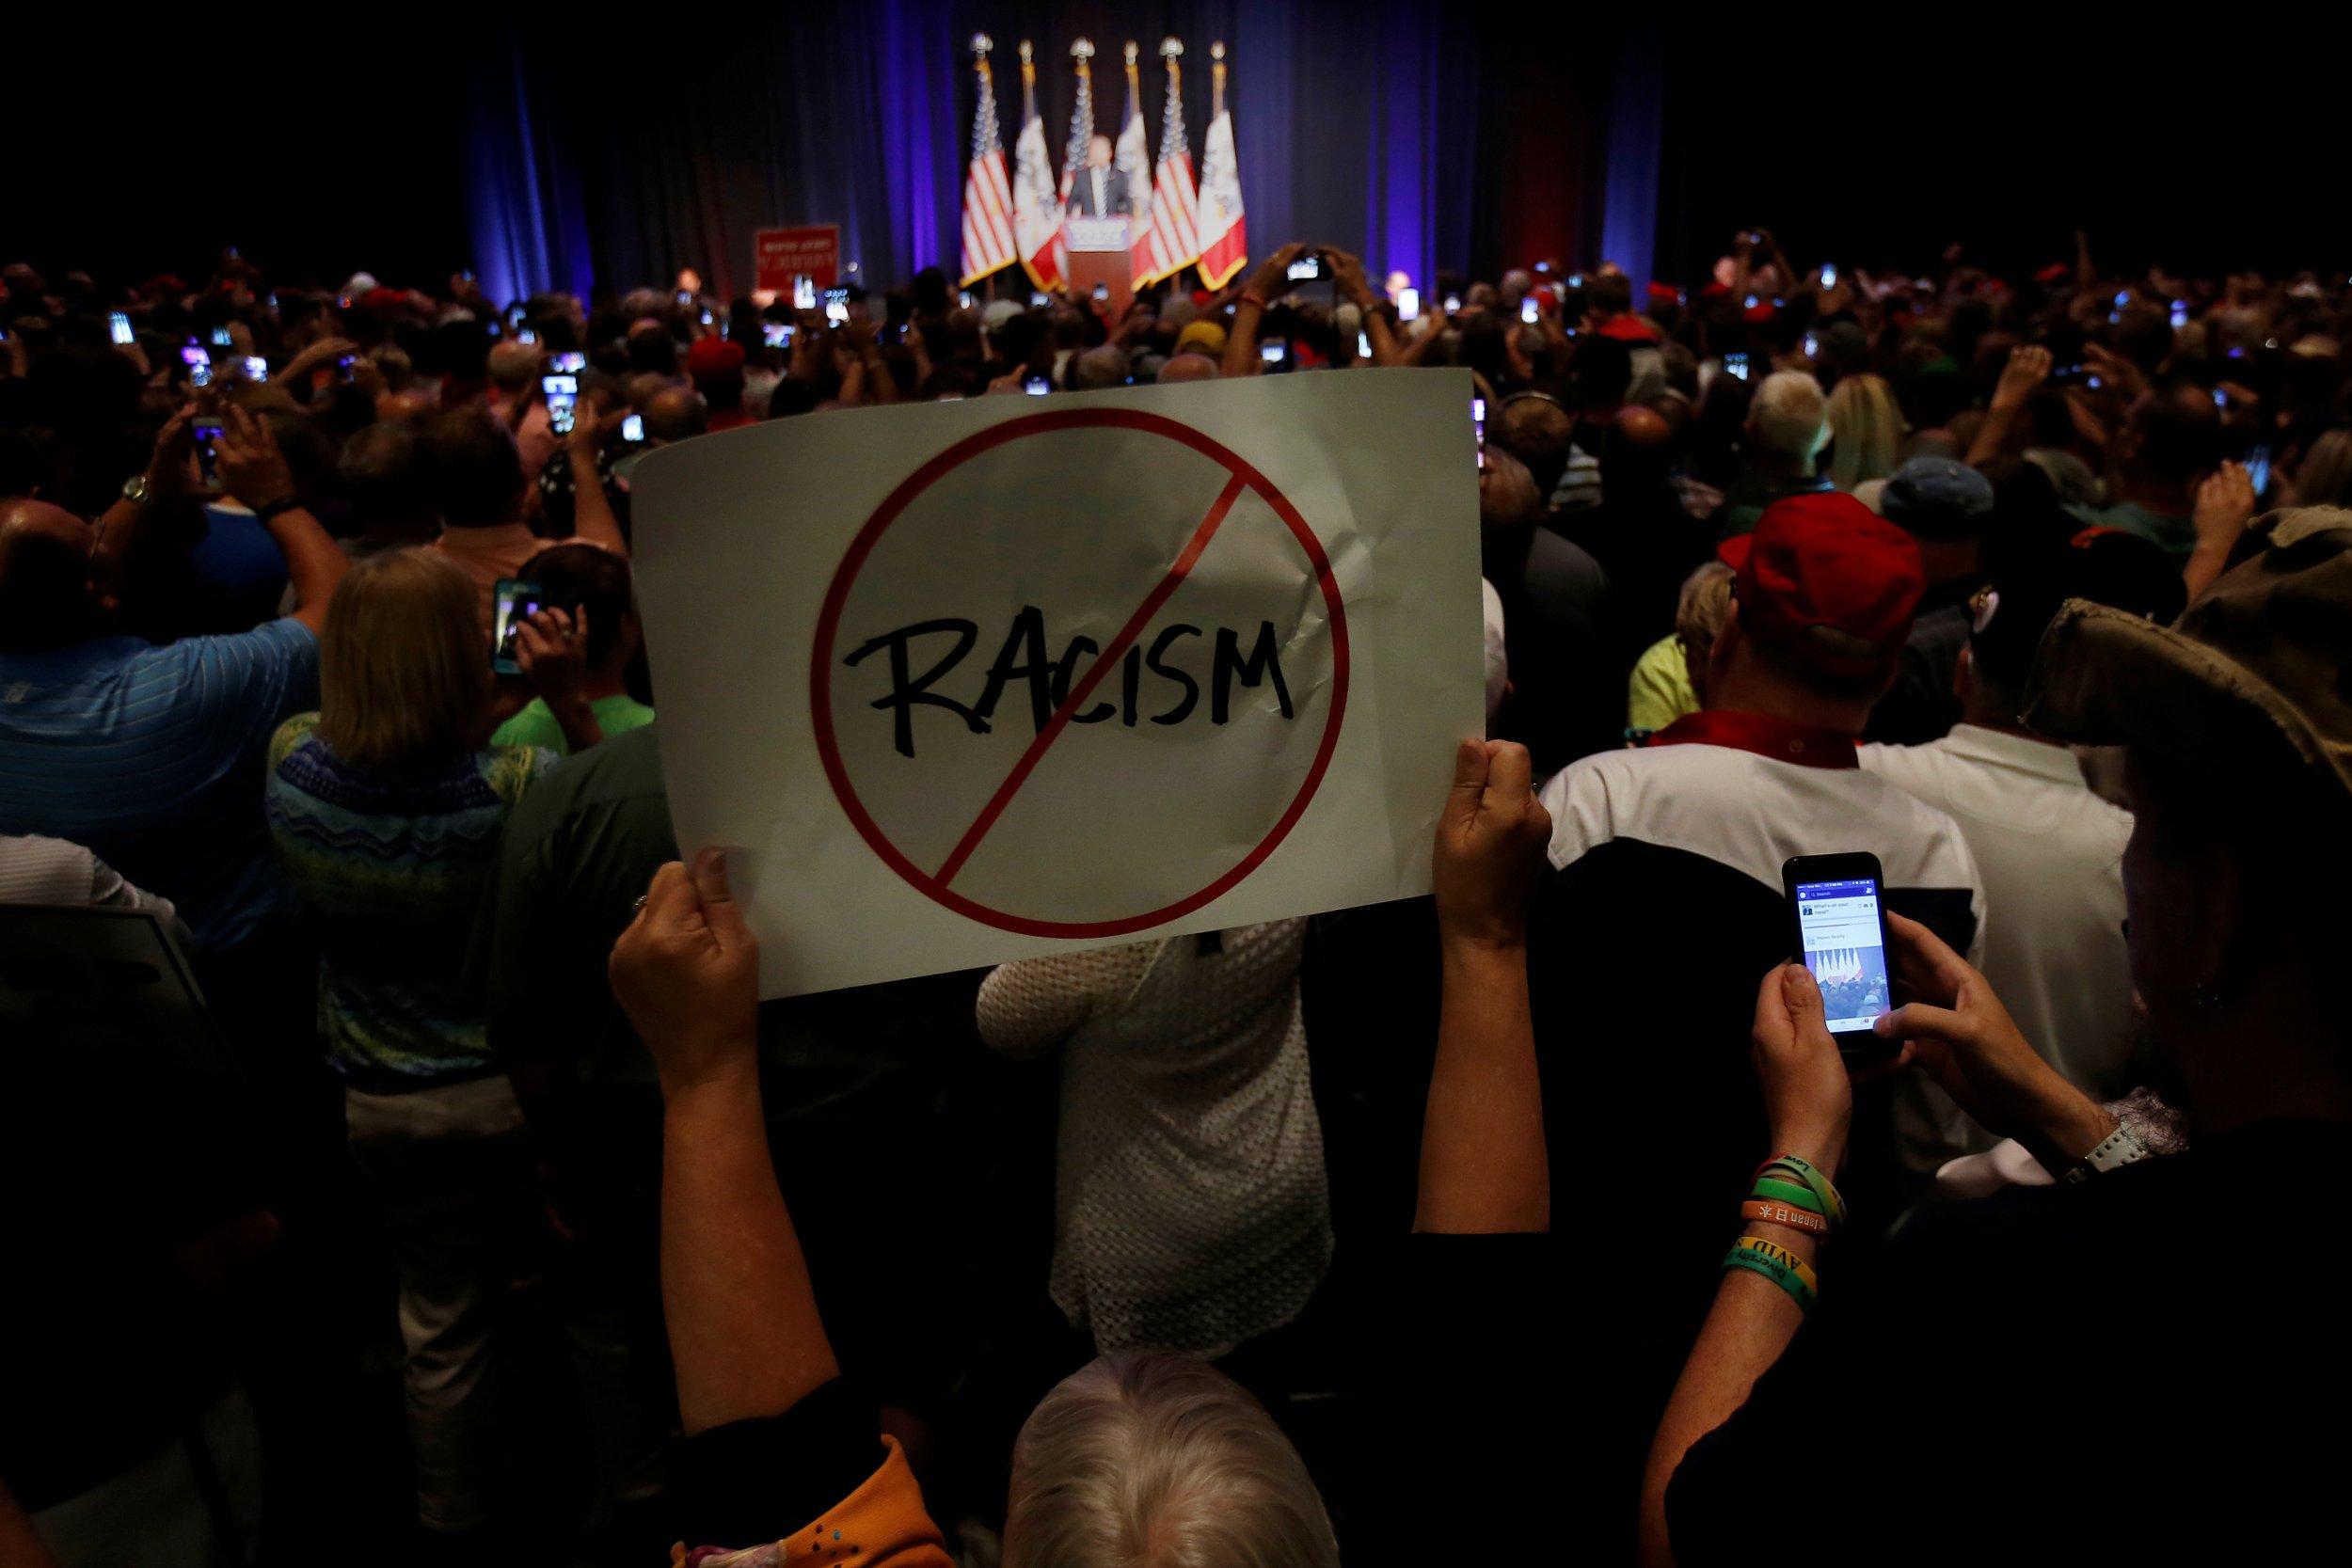 Donald Trump poll N-word racist